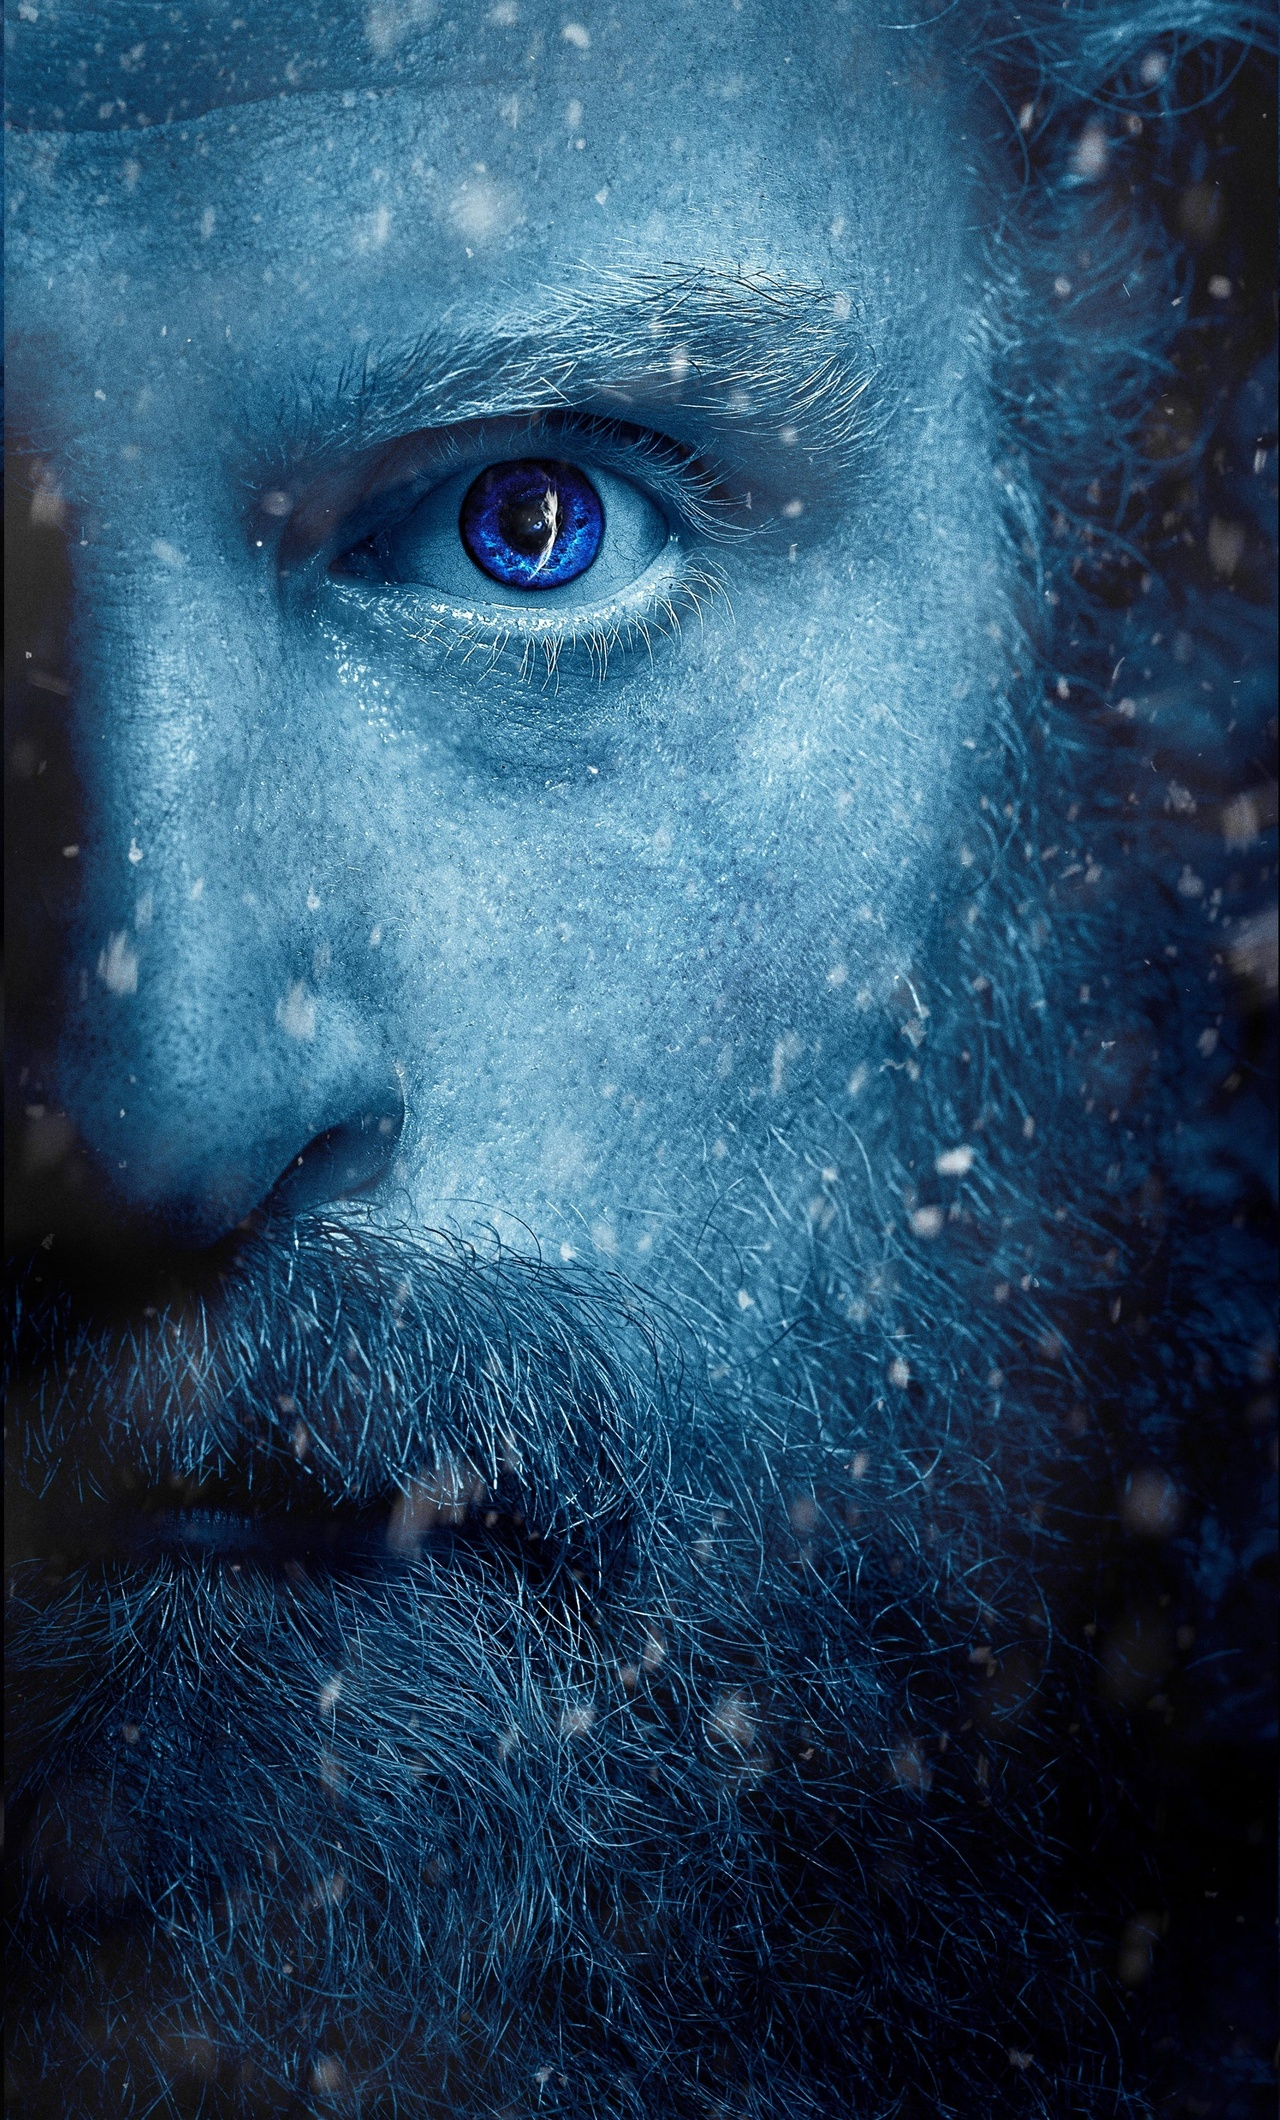 Game Of Thrones Season 7 Iphone Wallpaper